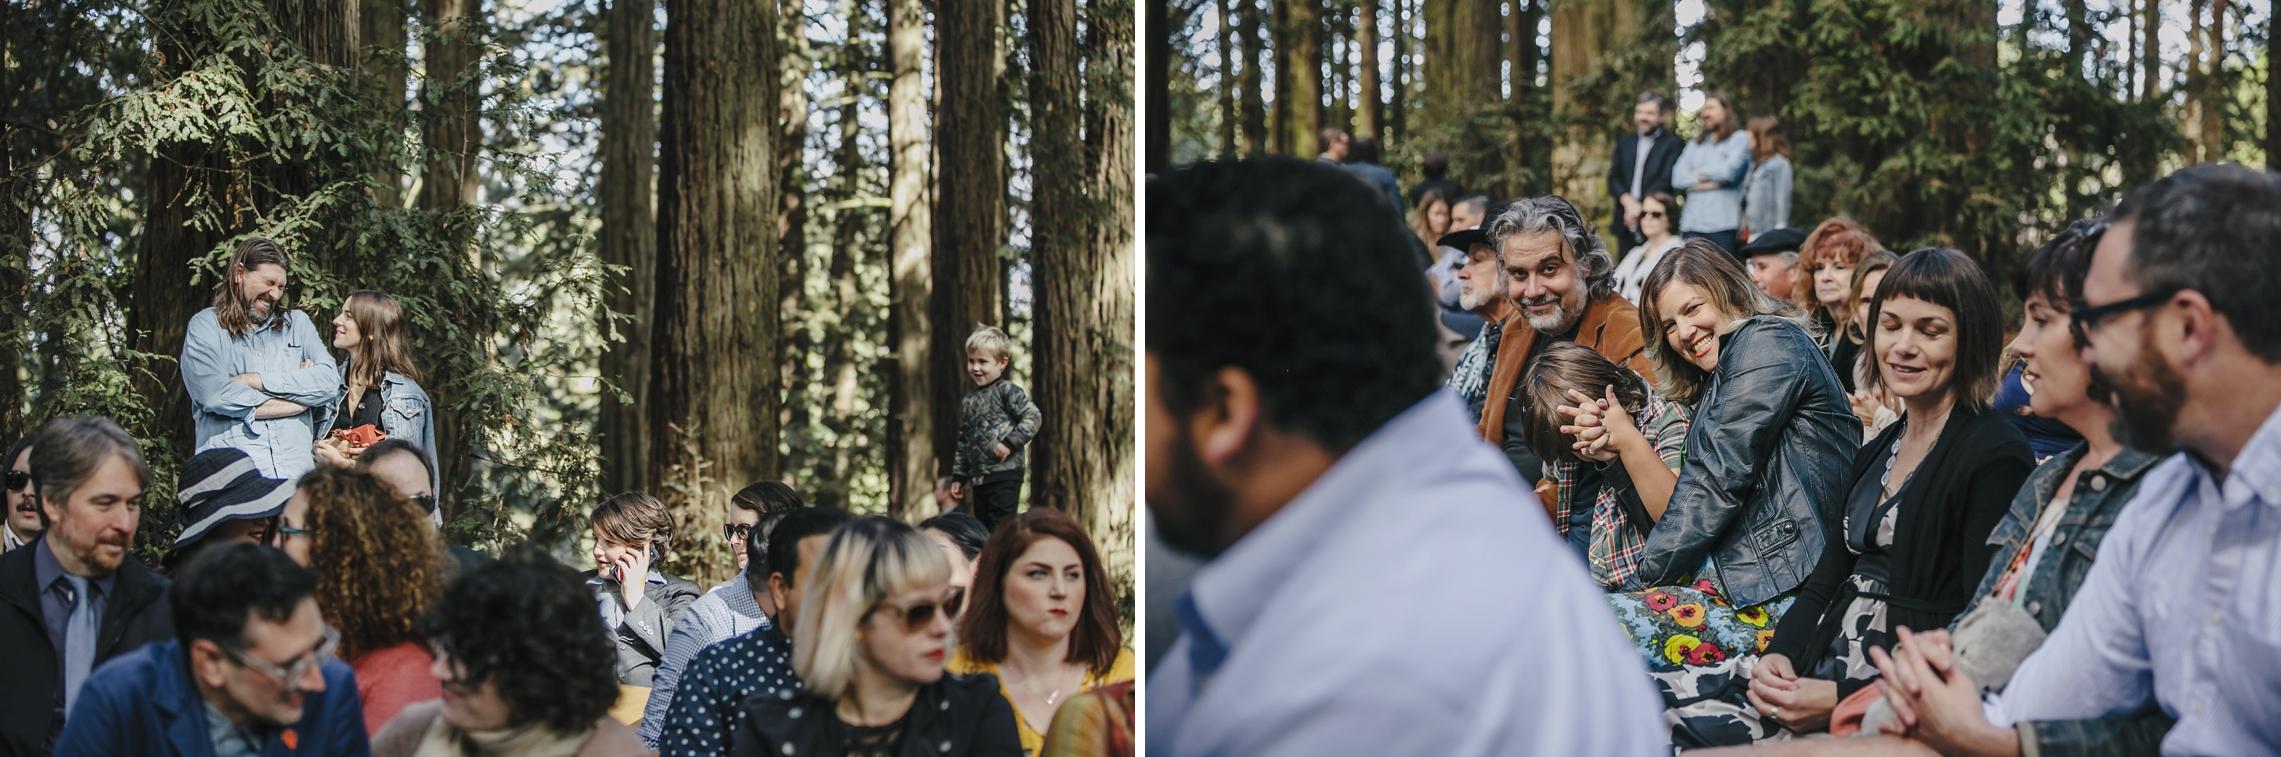 Redwood regional-oakland-wedding_0004.jpg